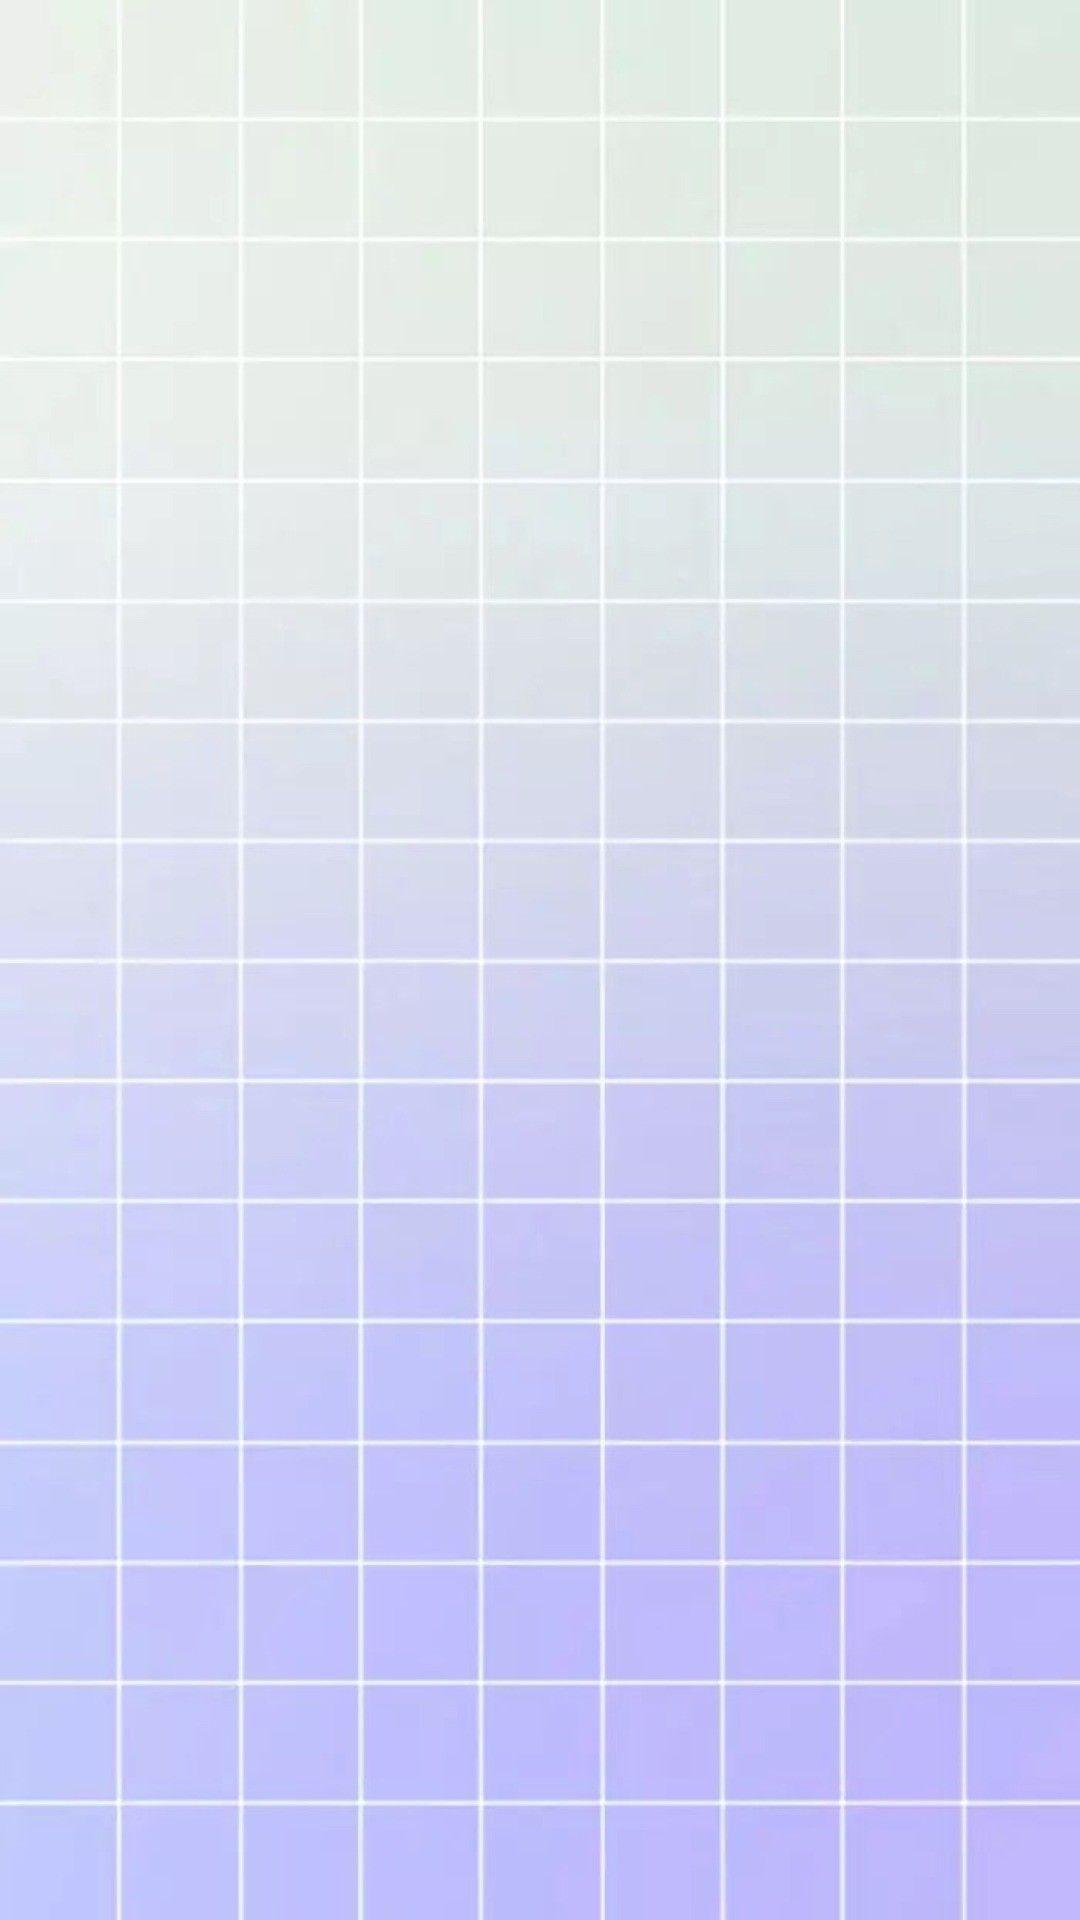 Pastel Iphone Wallpapers Top Free Pastel Iphone